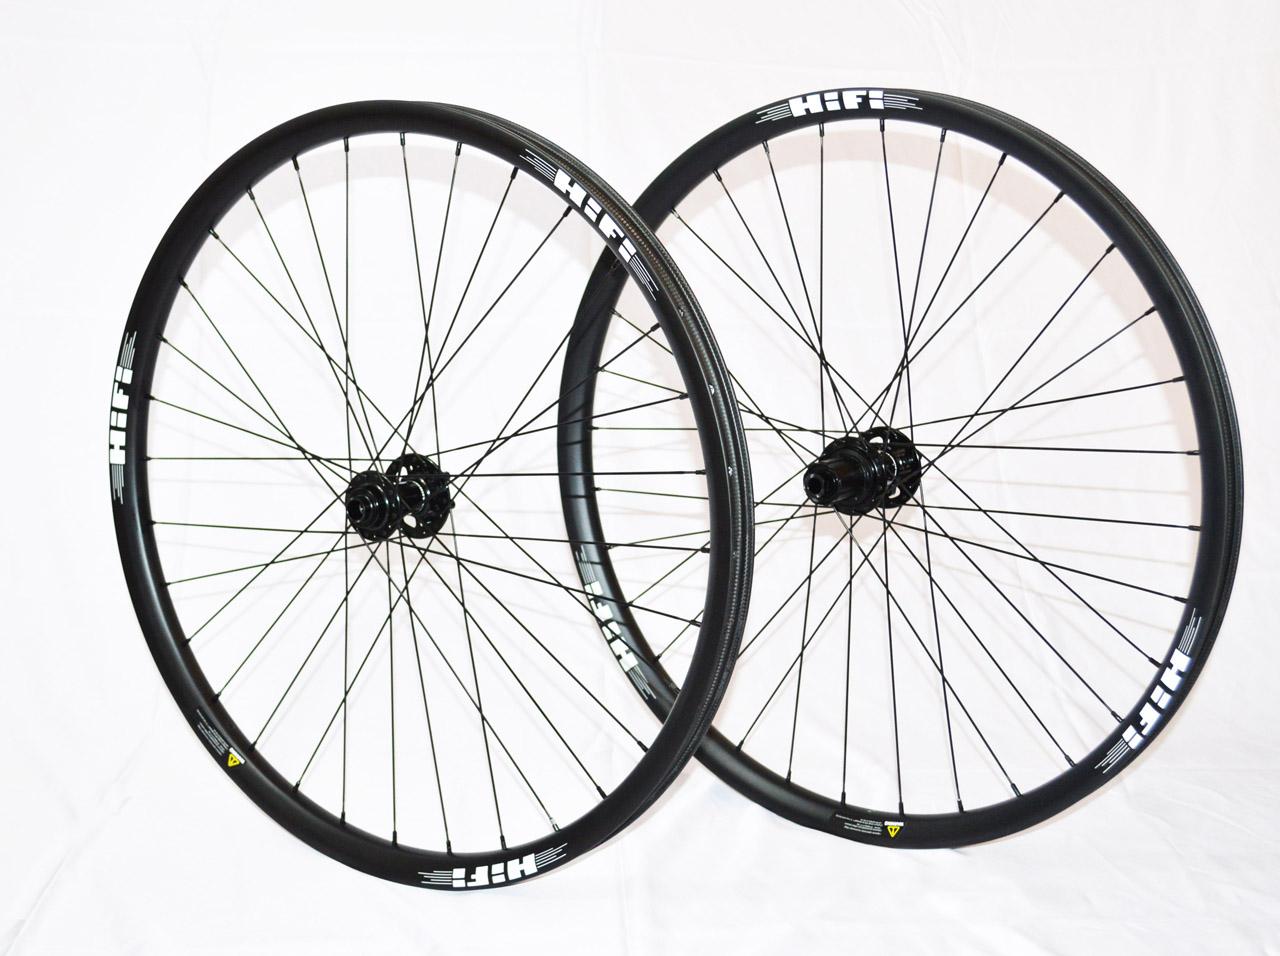 HiFi Session Wide 27.5 carbon MTB wheels